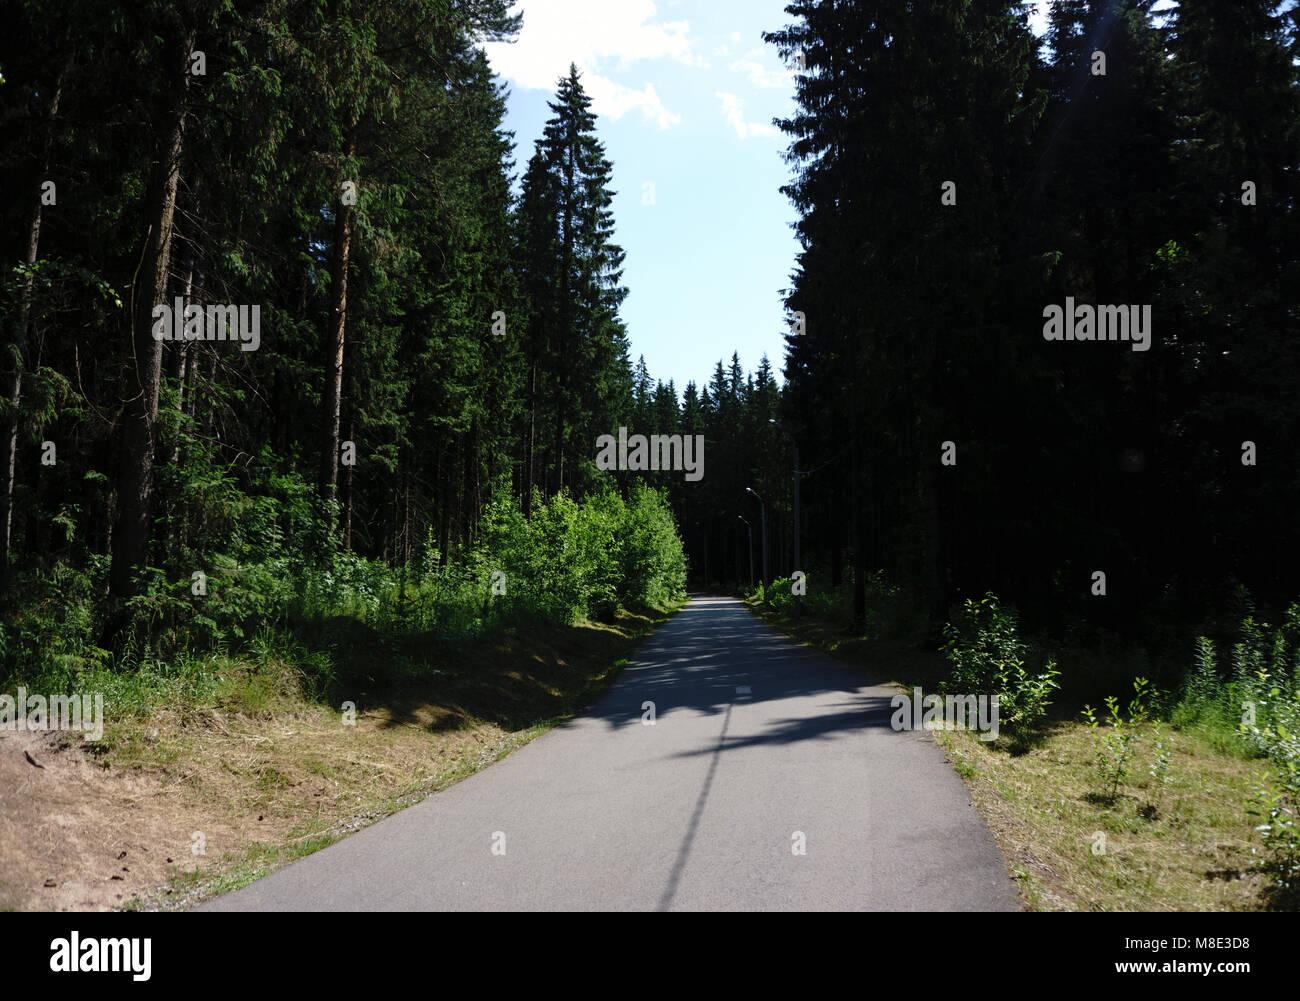 Asphalt road in green forest - Stock Image